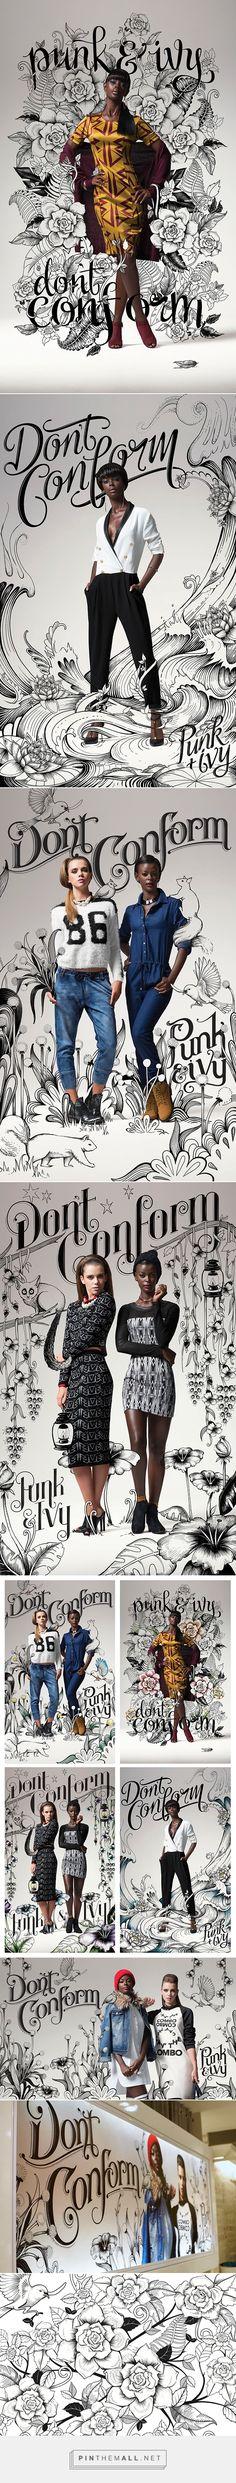 56e2987da3 LEGiT Don't Conform Campaign on SCAD Portfolios - Dani Loureiro Graphic  Design Portfolios,